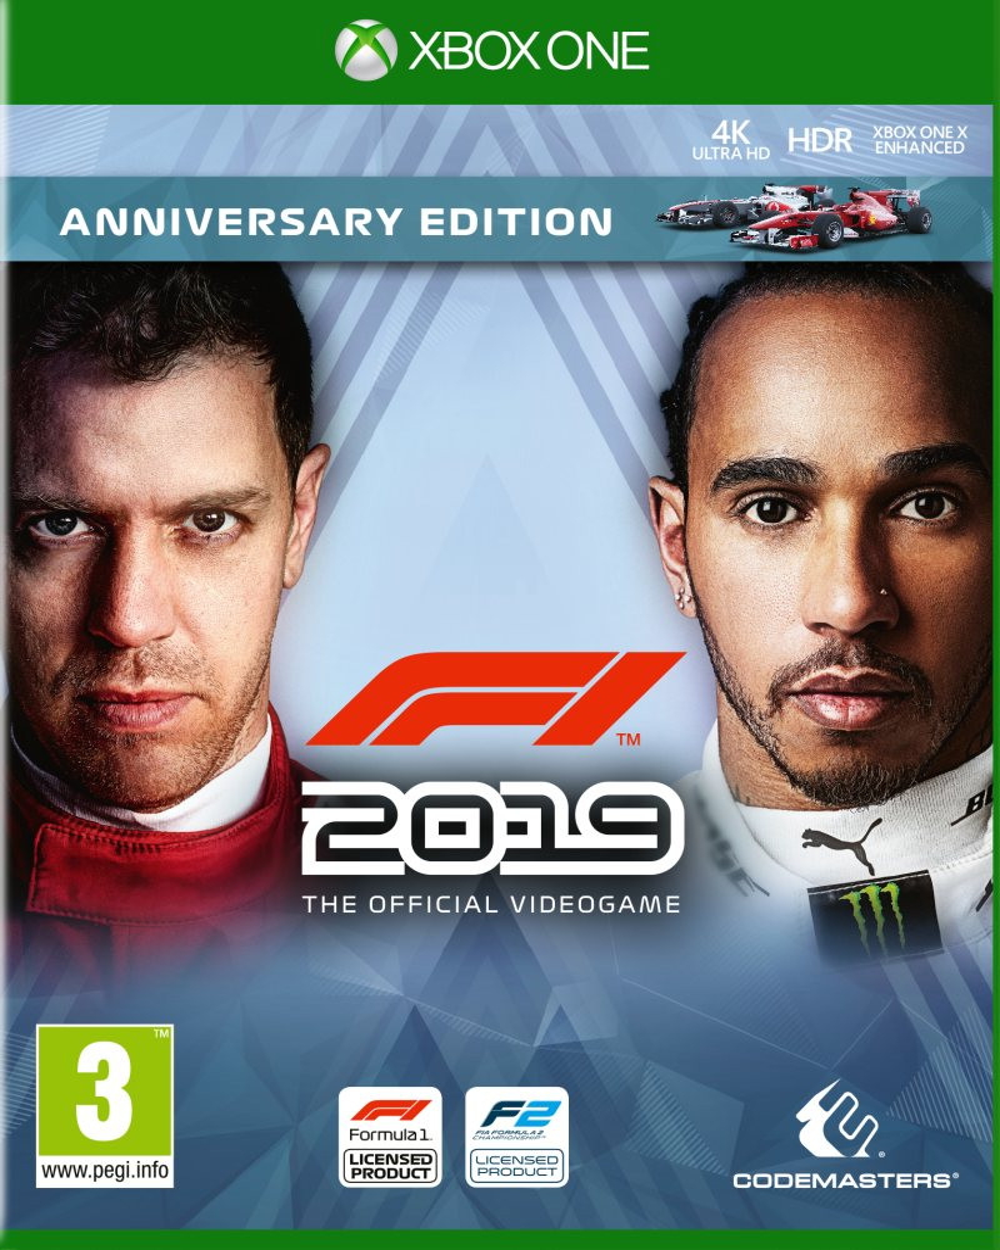 XBOX ONE F1 2019 - Anniversary Edition - Formula 1 2019